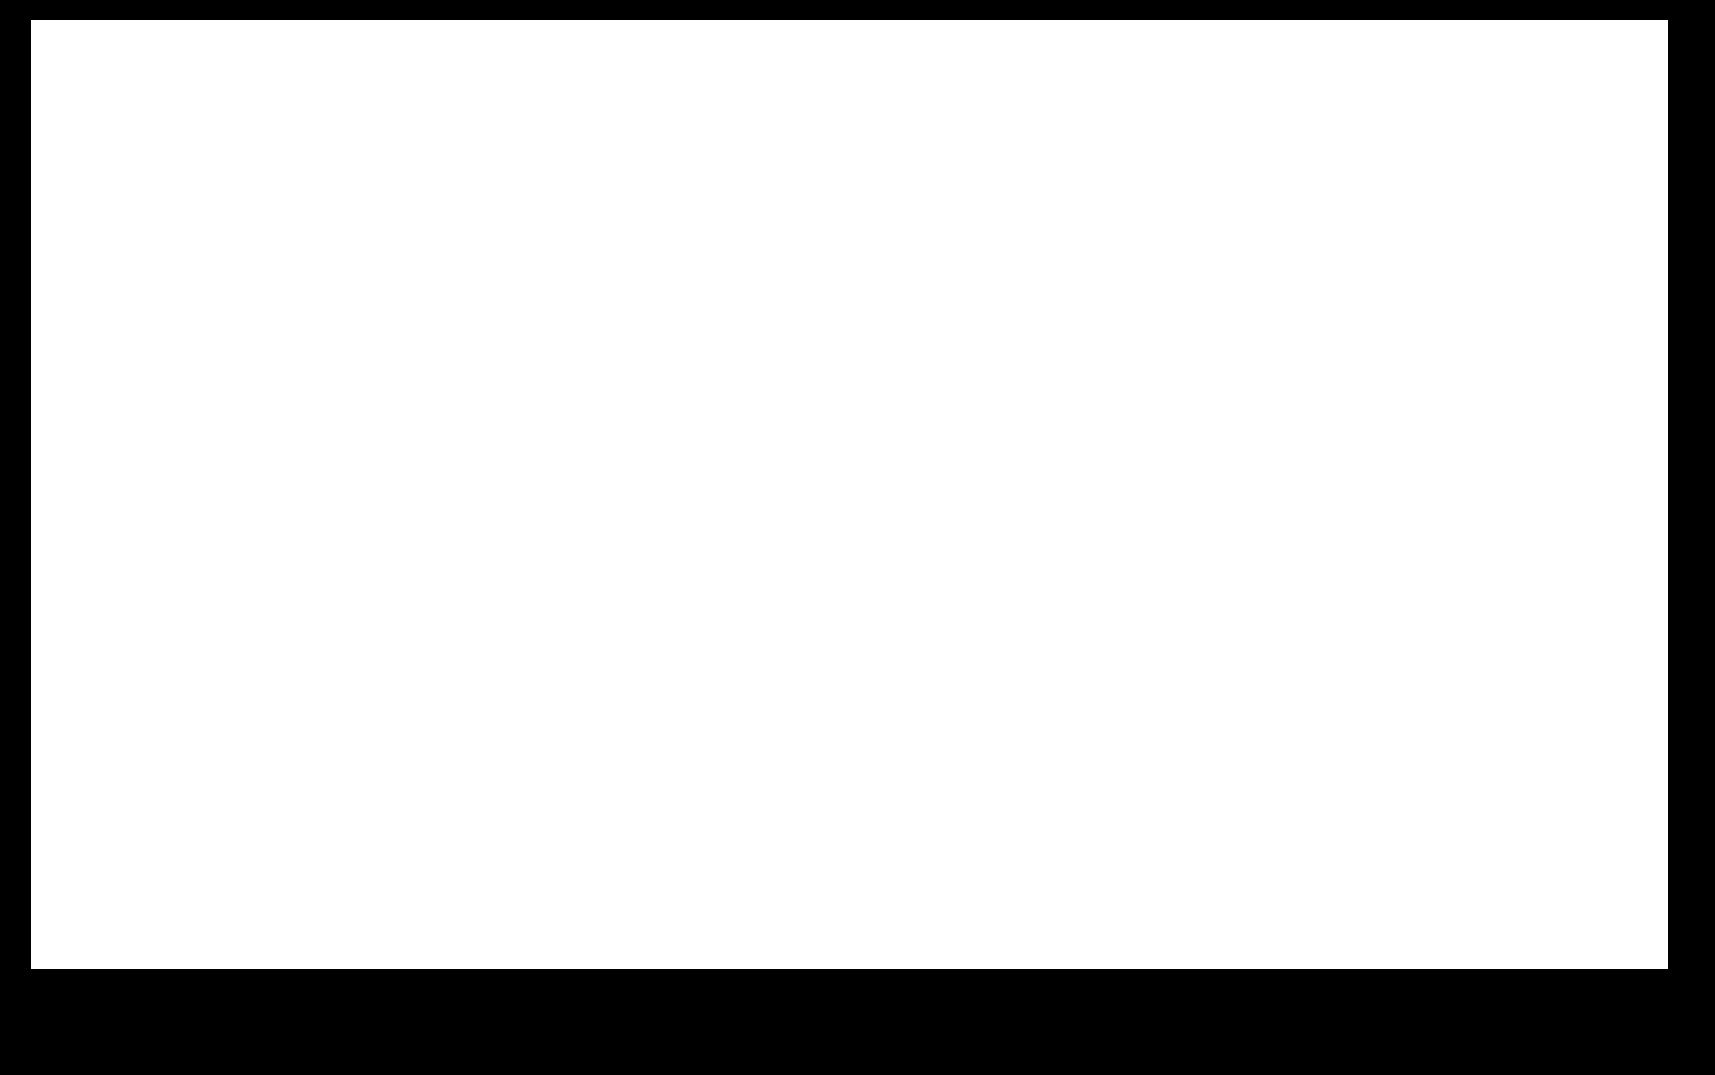 Neighbors clipart poor neighborhood. Wellness foundation connecting to